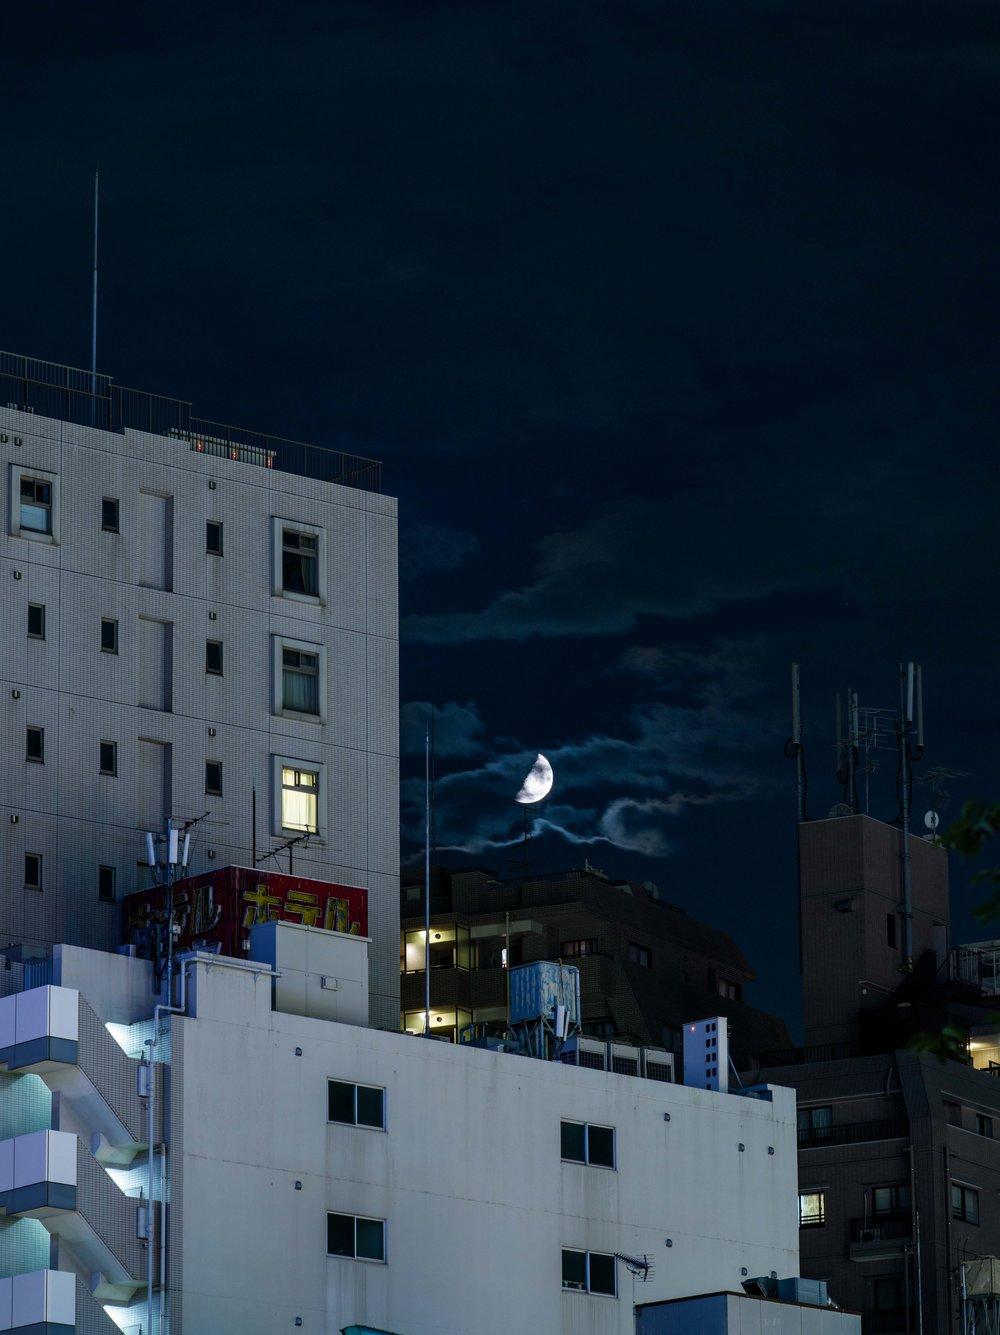 asakusa-street-photography_P640954.jpg